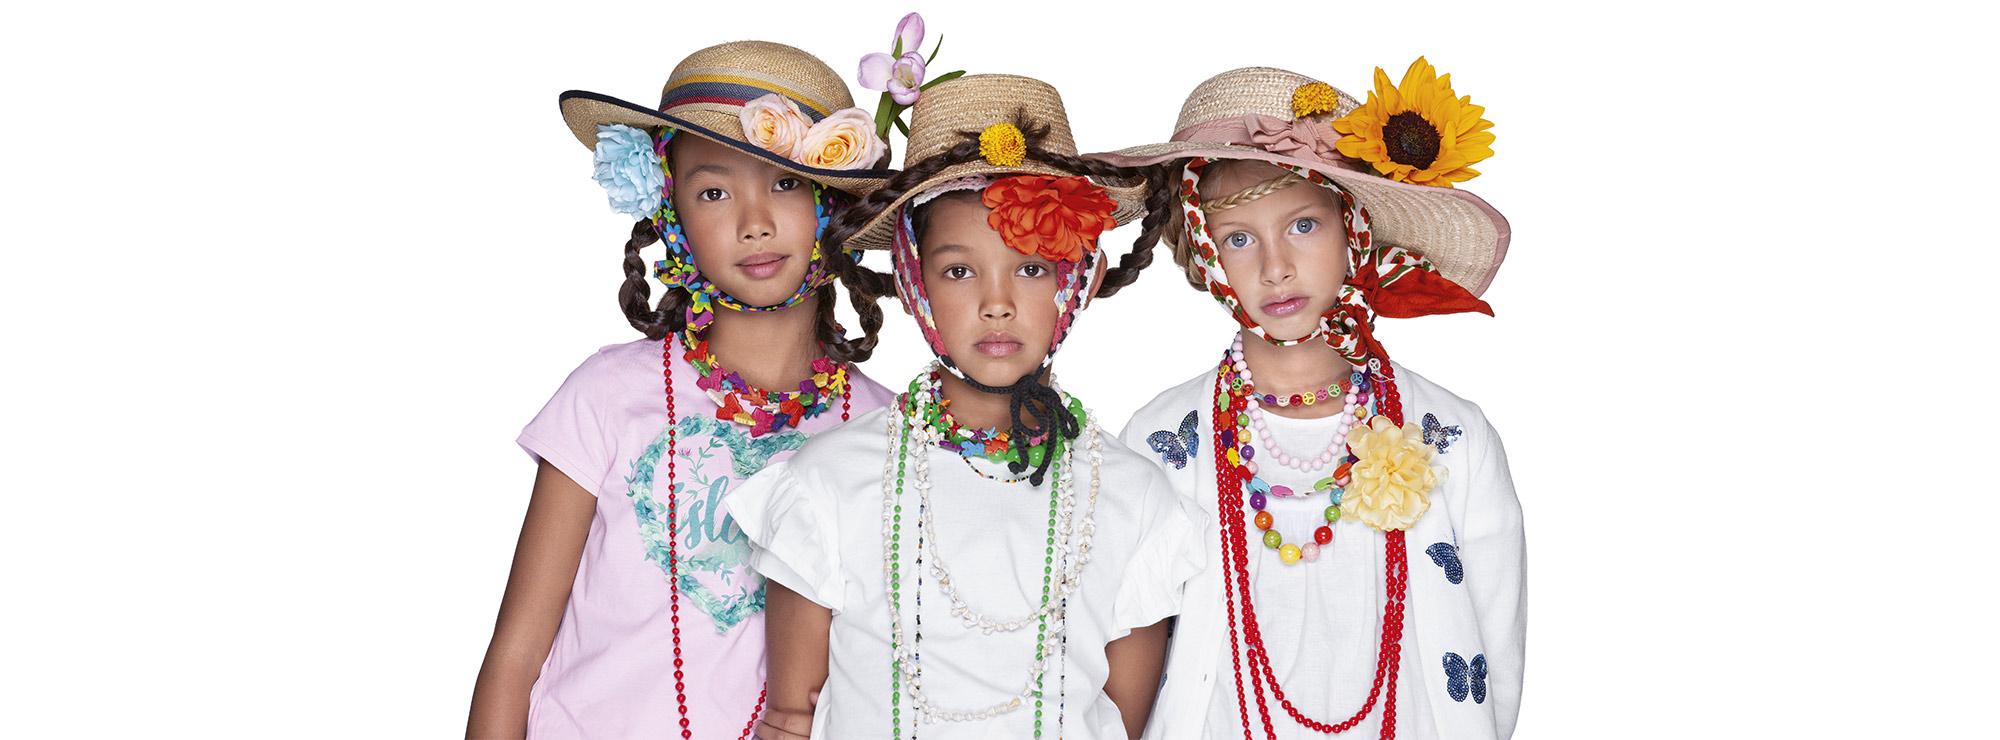 1e0a18c943d Κοριτσίστικη Ένδυση Παιδική Collection 2019 | Benetton